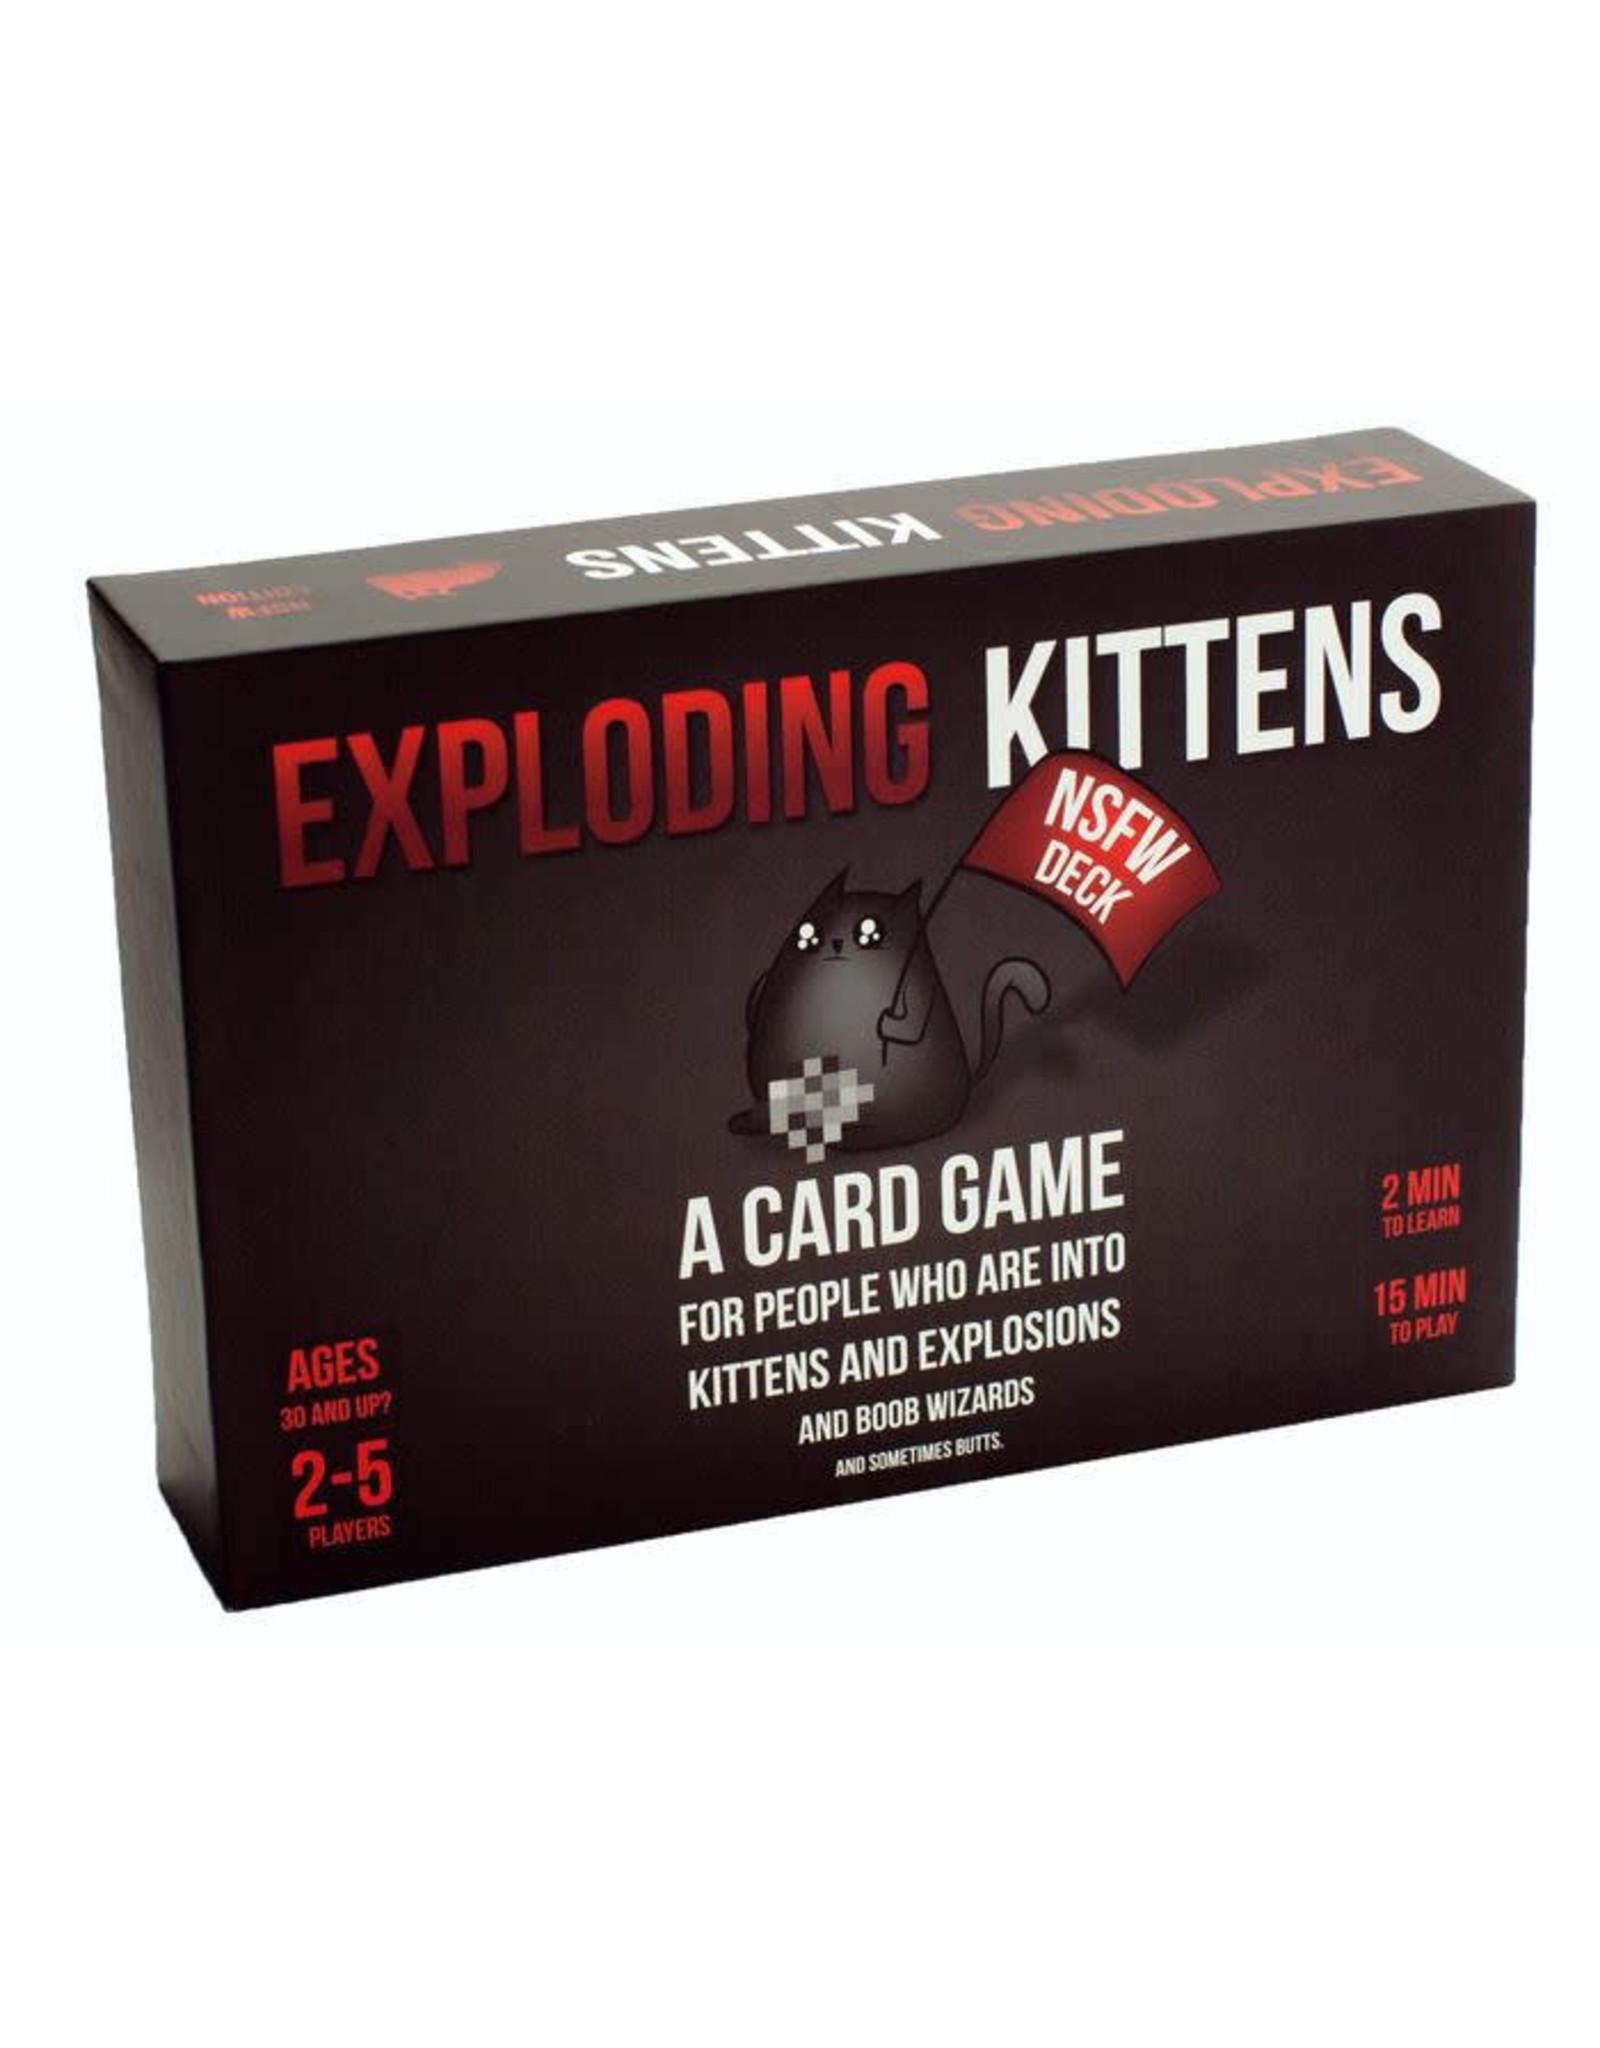 EXPLODING KITTENS EXPLODING KITTENS NSFW EDITION (English)